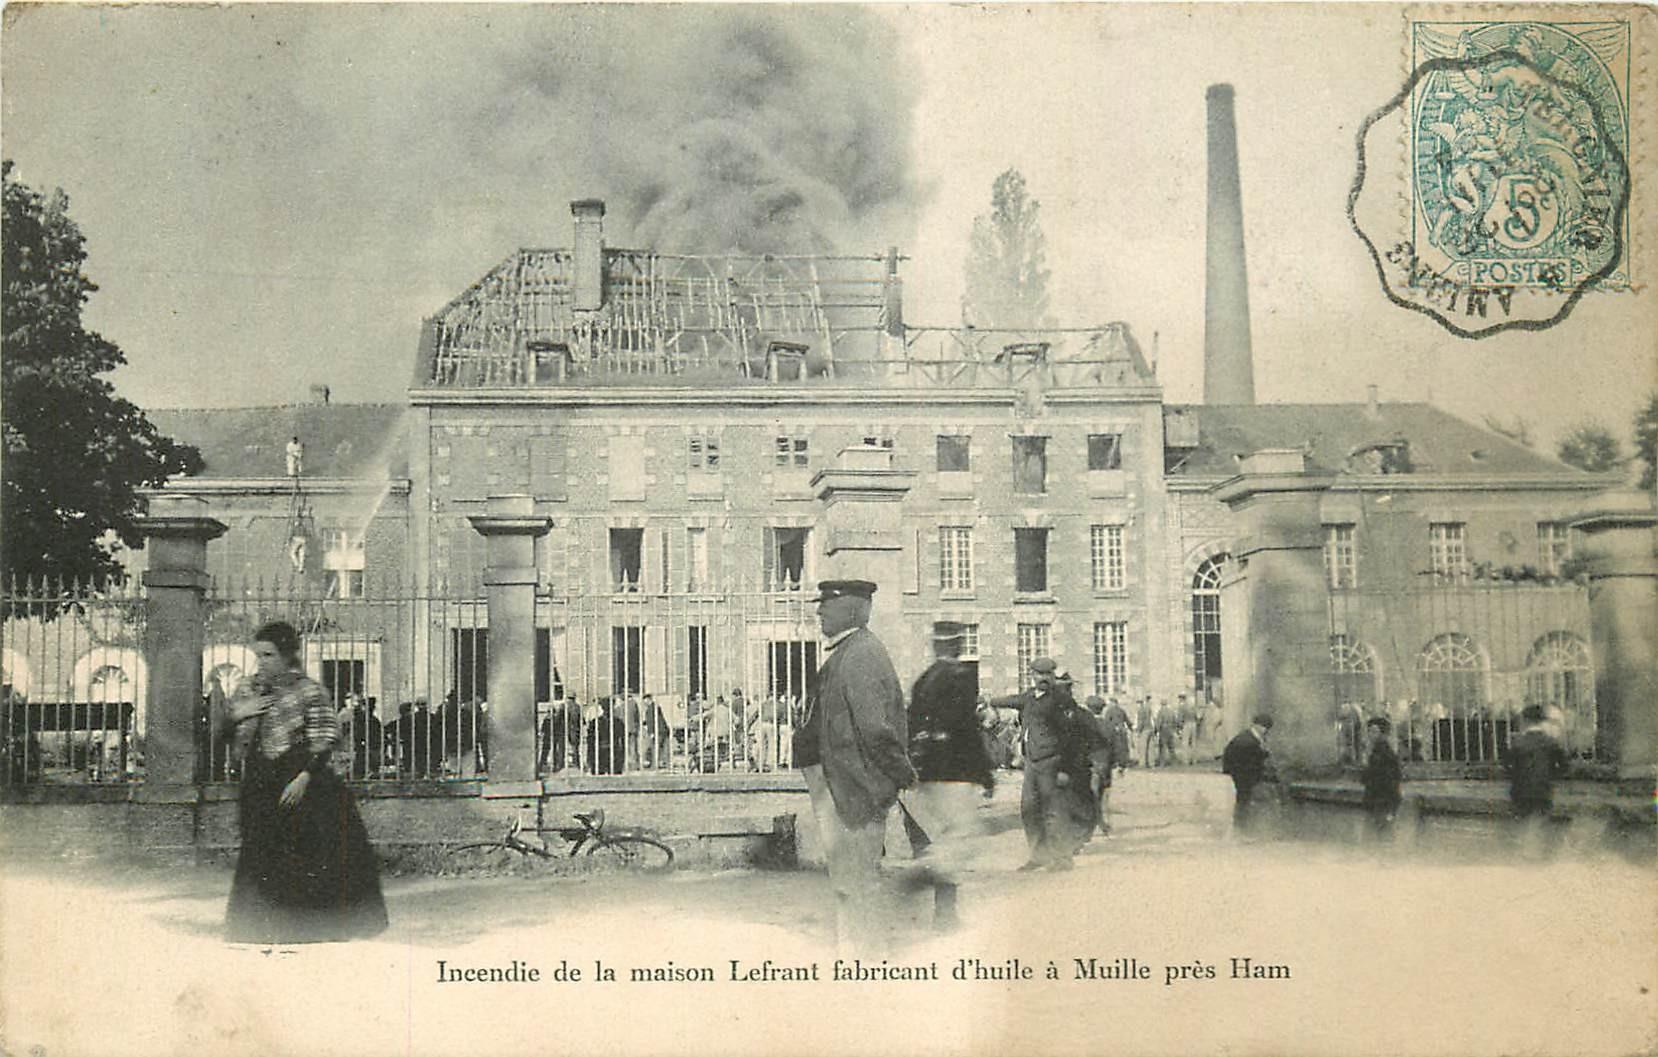 80 MUILLE. Incendie maison Lefrant fabricant d'huile 1904